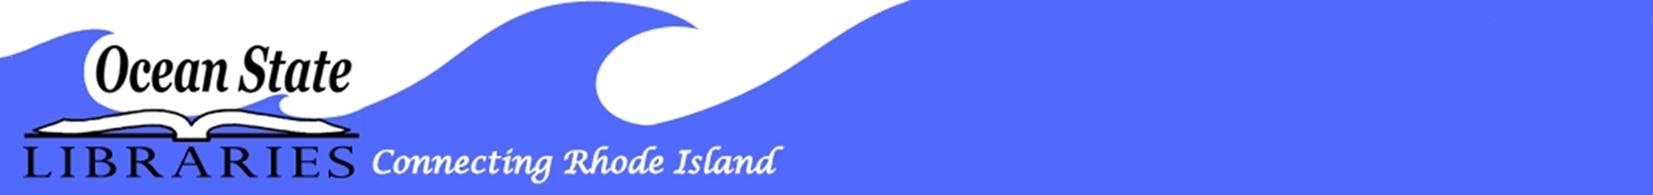 Ocean State Libraries Logo